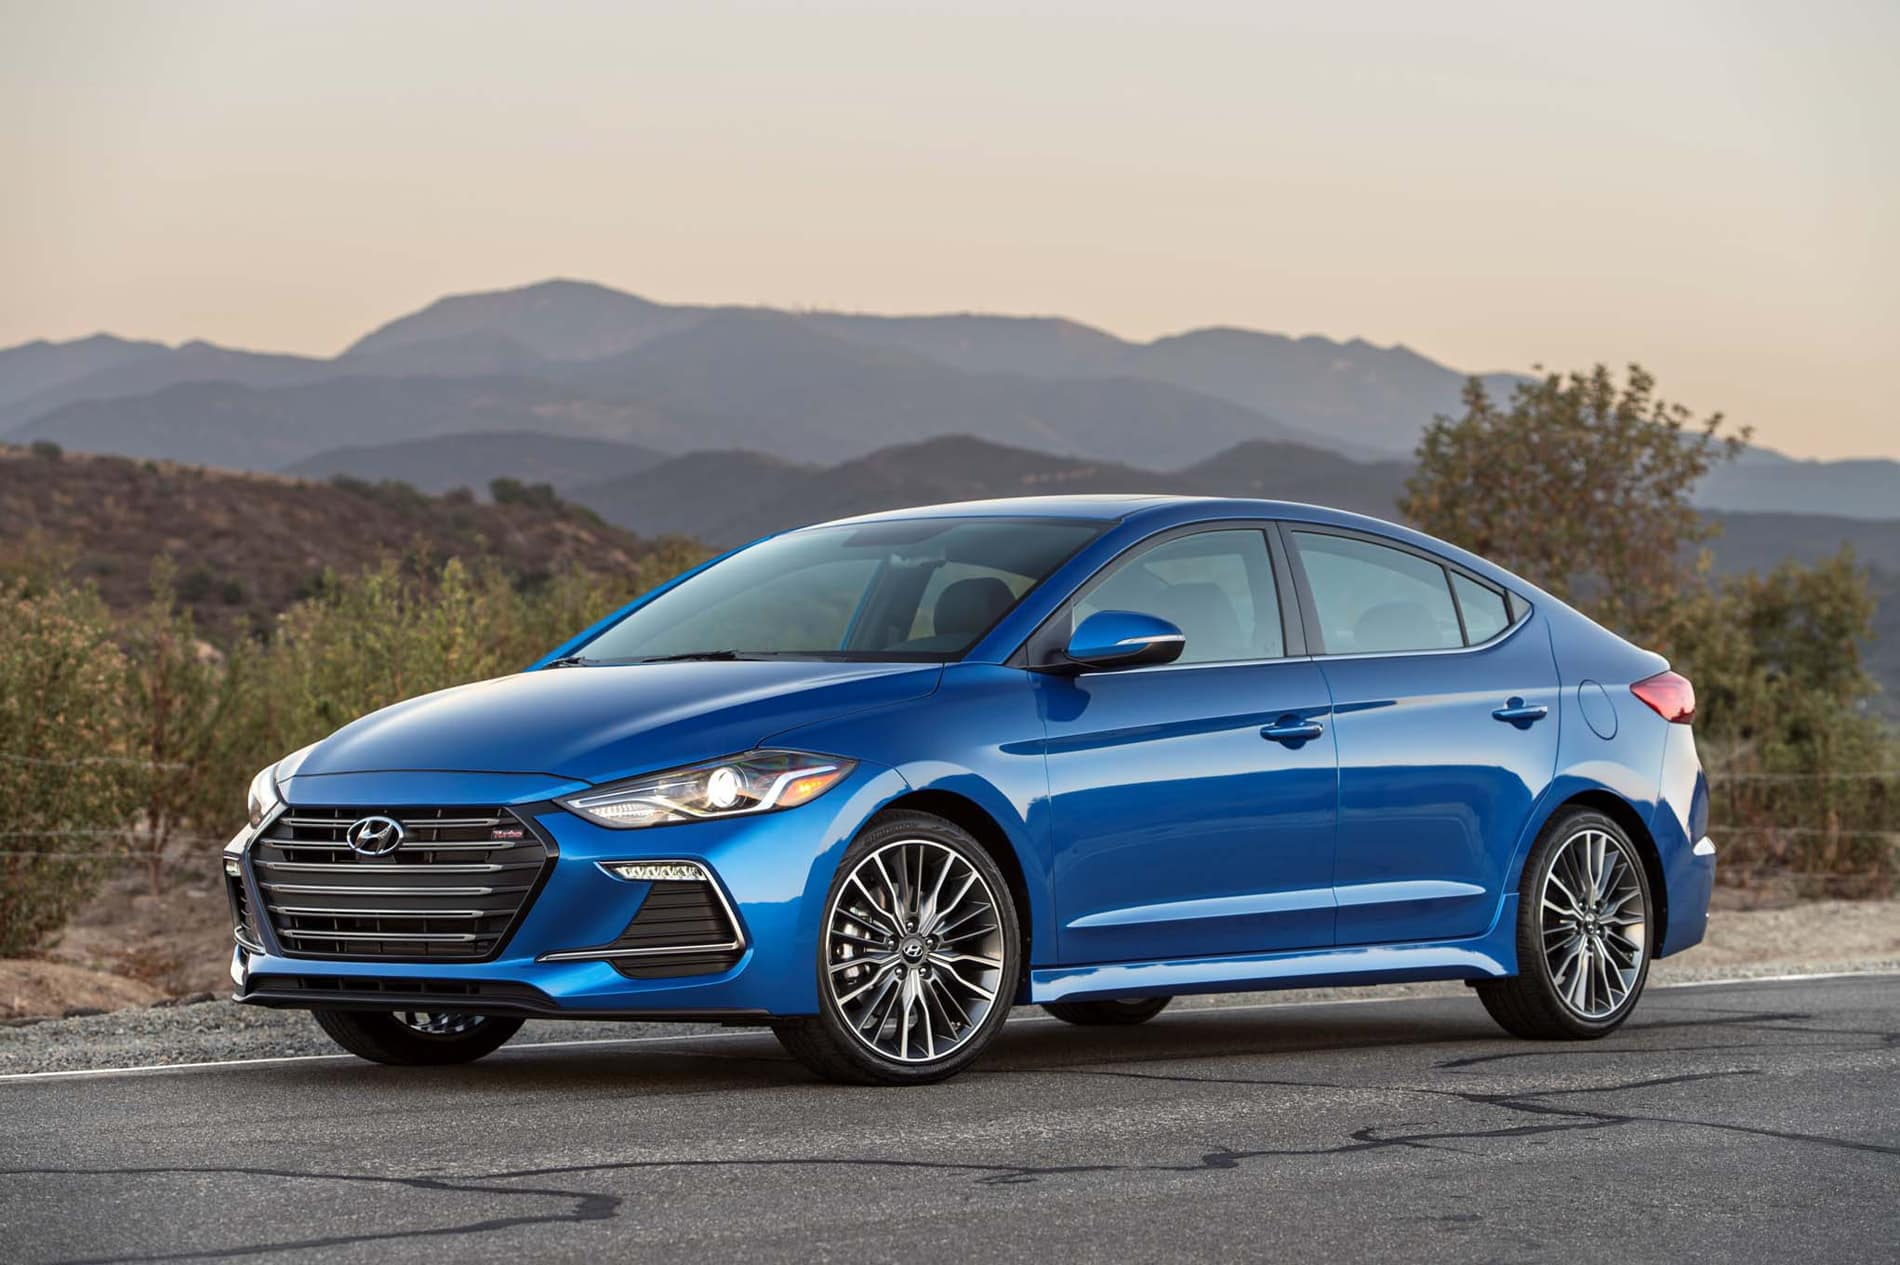 Best New Car For Teens 2017 Hyundai Elantra 2012 Fuel Filter